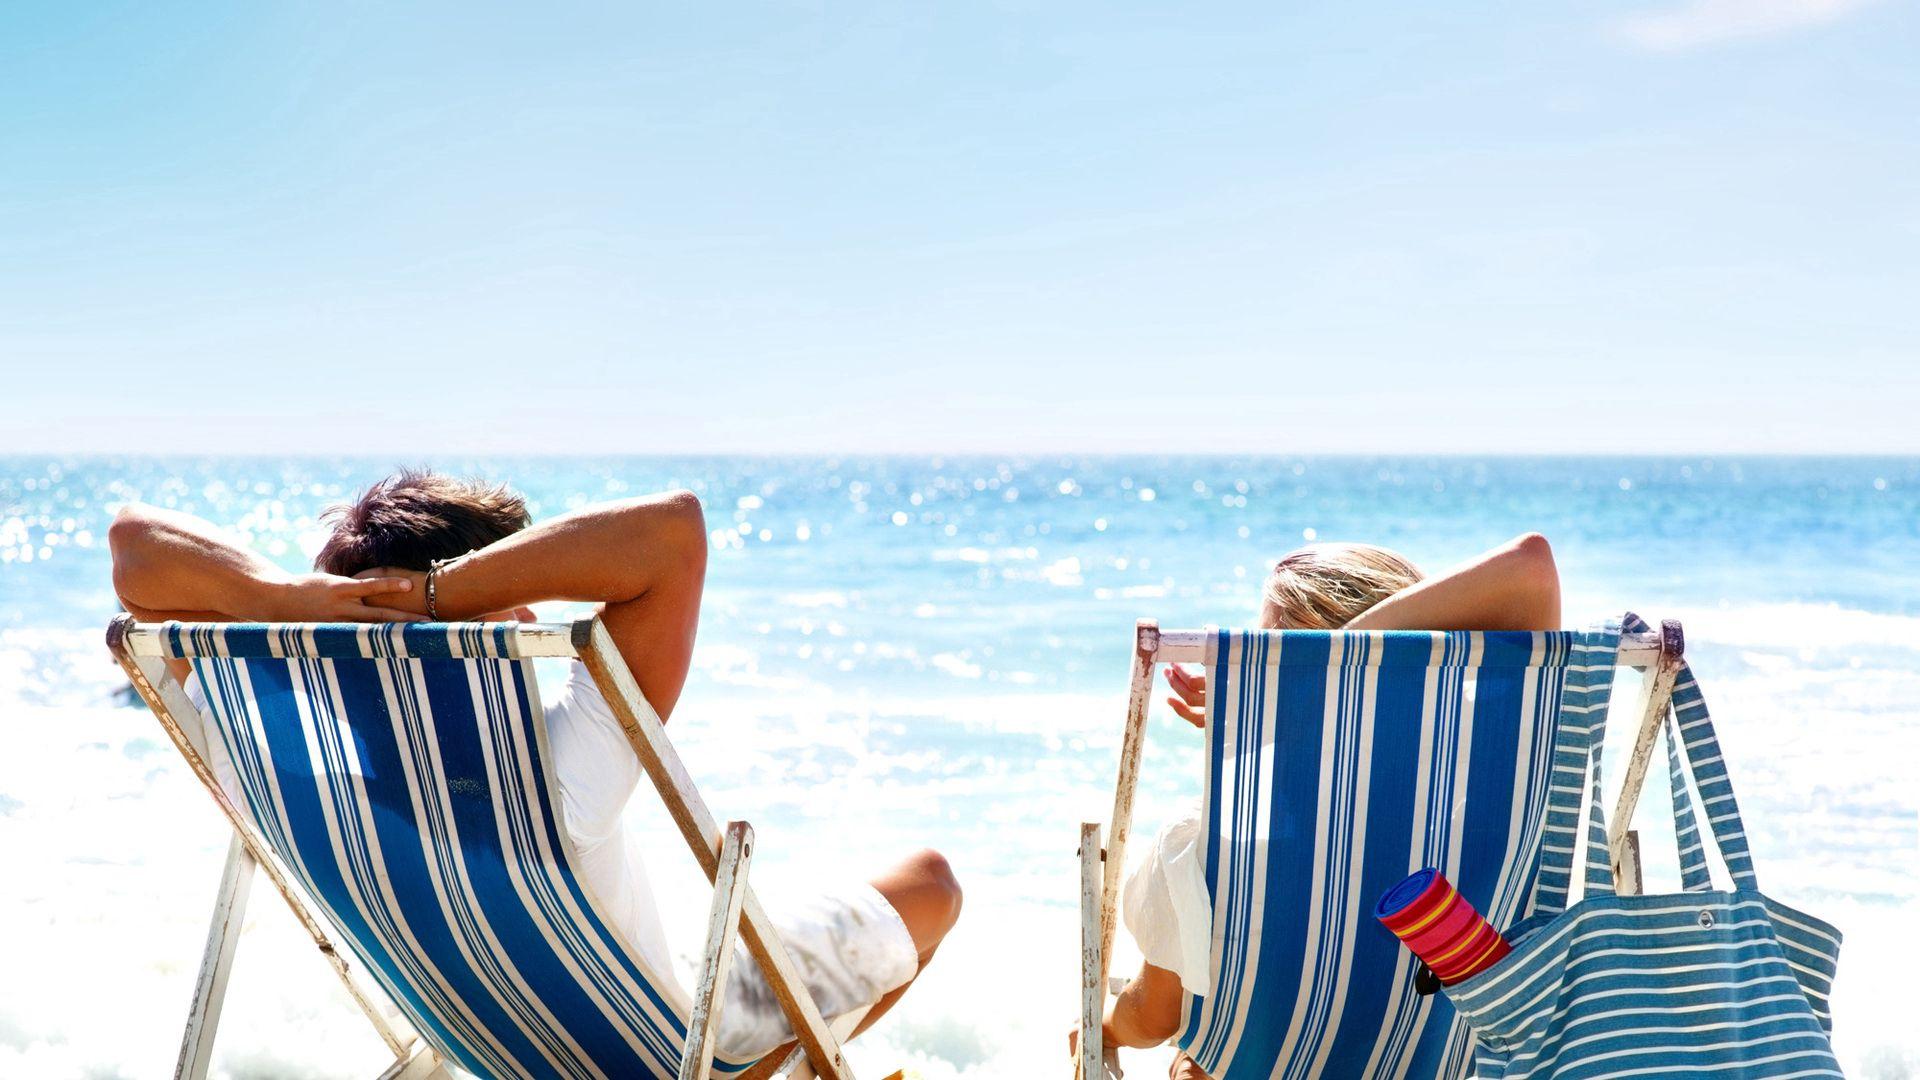 136989 download wallpaper Miscellanea, Miscellaneous, Sun Loungers, Sun Beds, Couple, Pair, Sunbathe, Beach, Sea, Sand, Sun screensavers and pictures for free